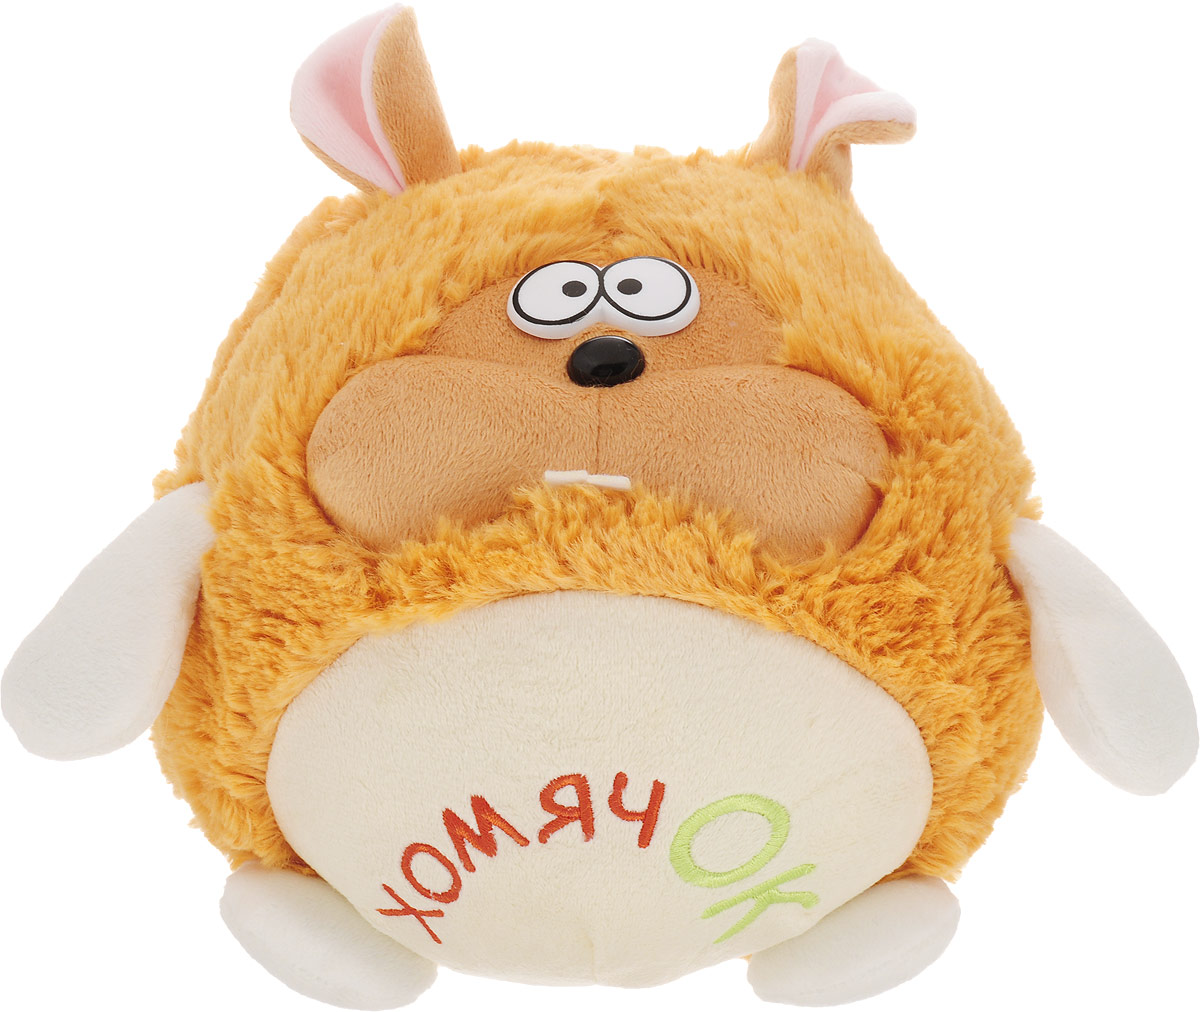 Fancy Мягкая игрушка Хомячок Круглик 18 см